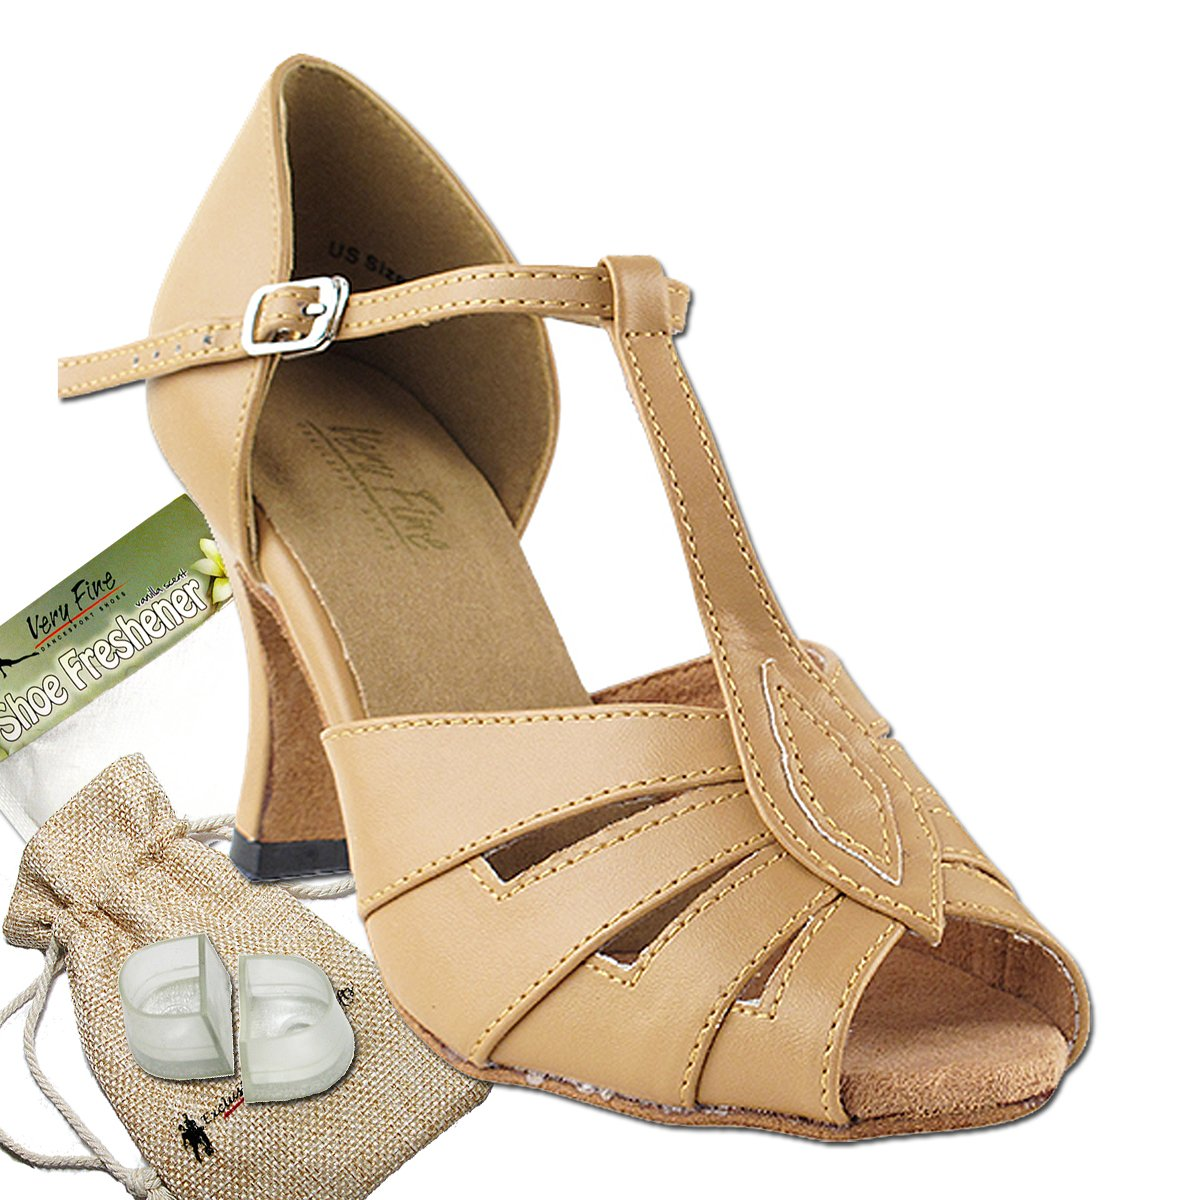 [Very Fine Dance Shoes] レディース B009B8IEO6 Beige Brown Leather 9.5 B(M) US